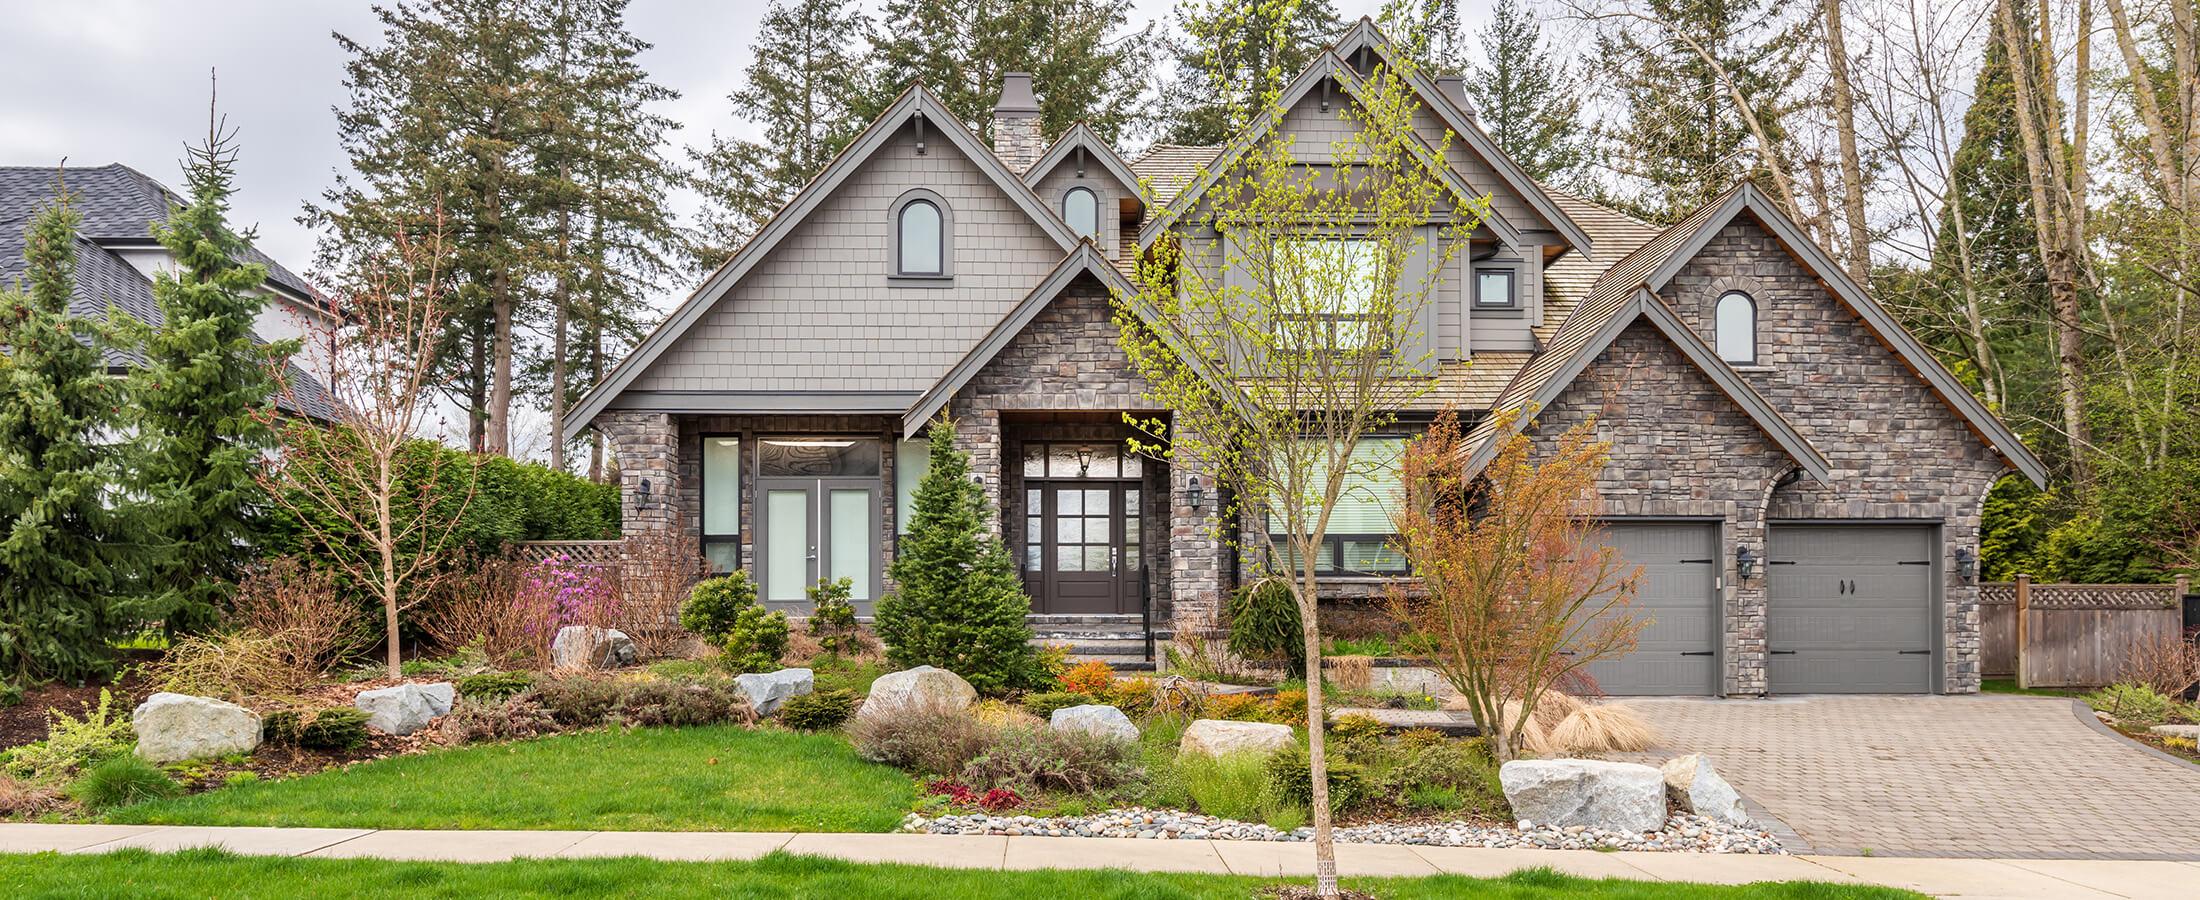 Homes For Sale Clemson, SC